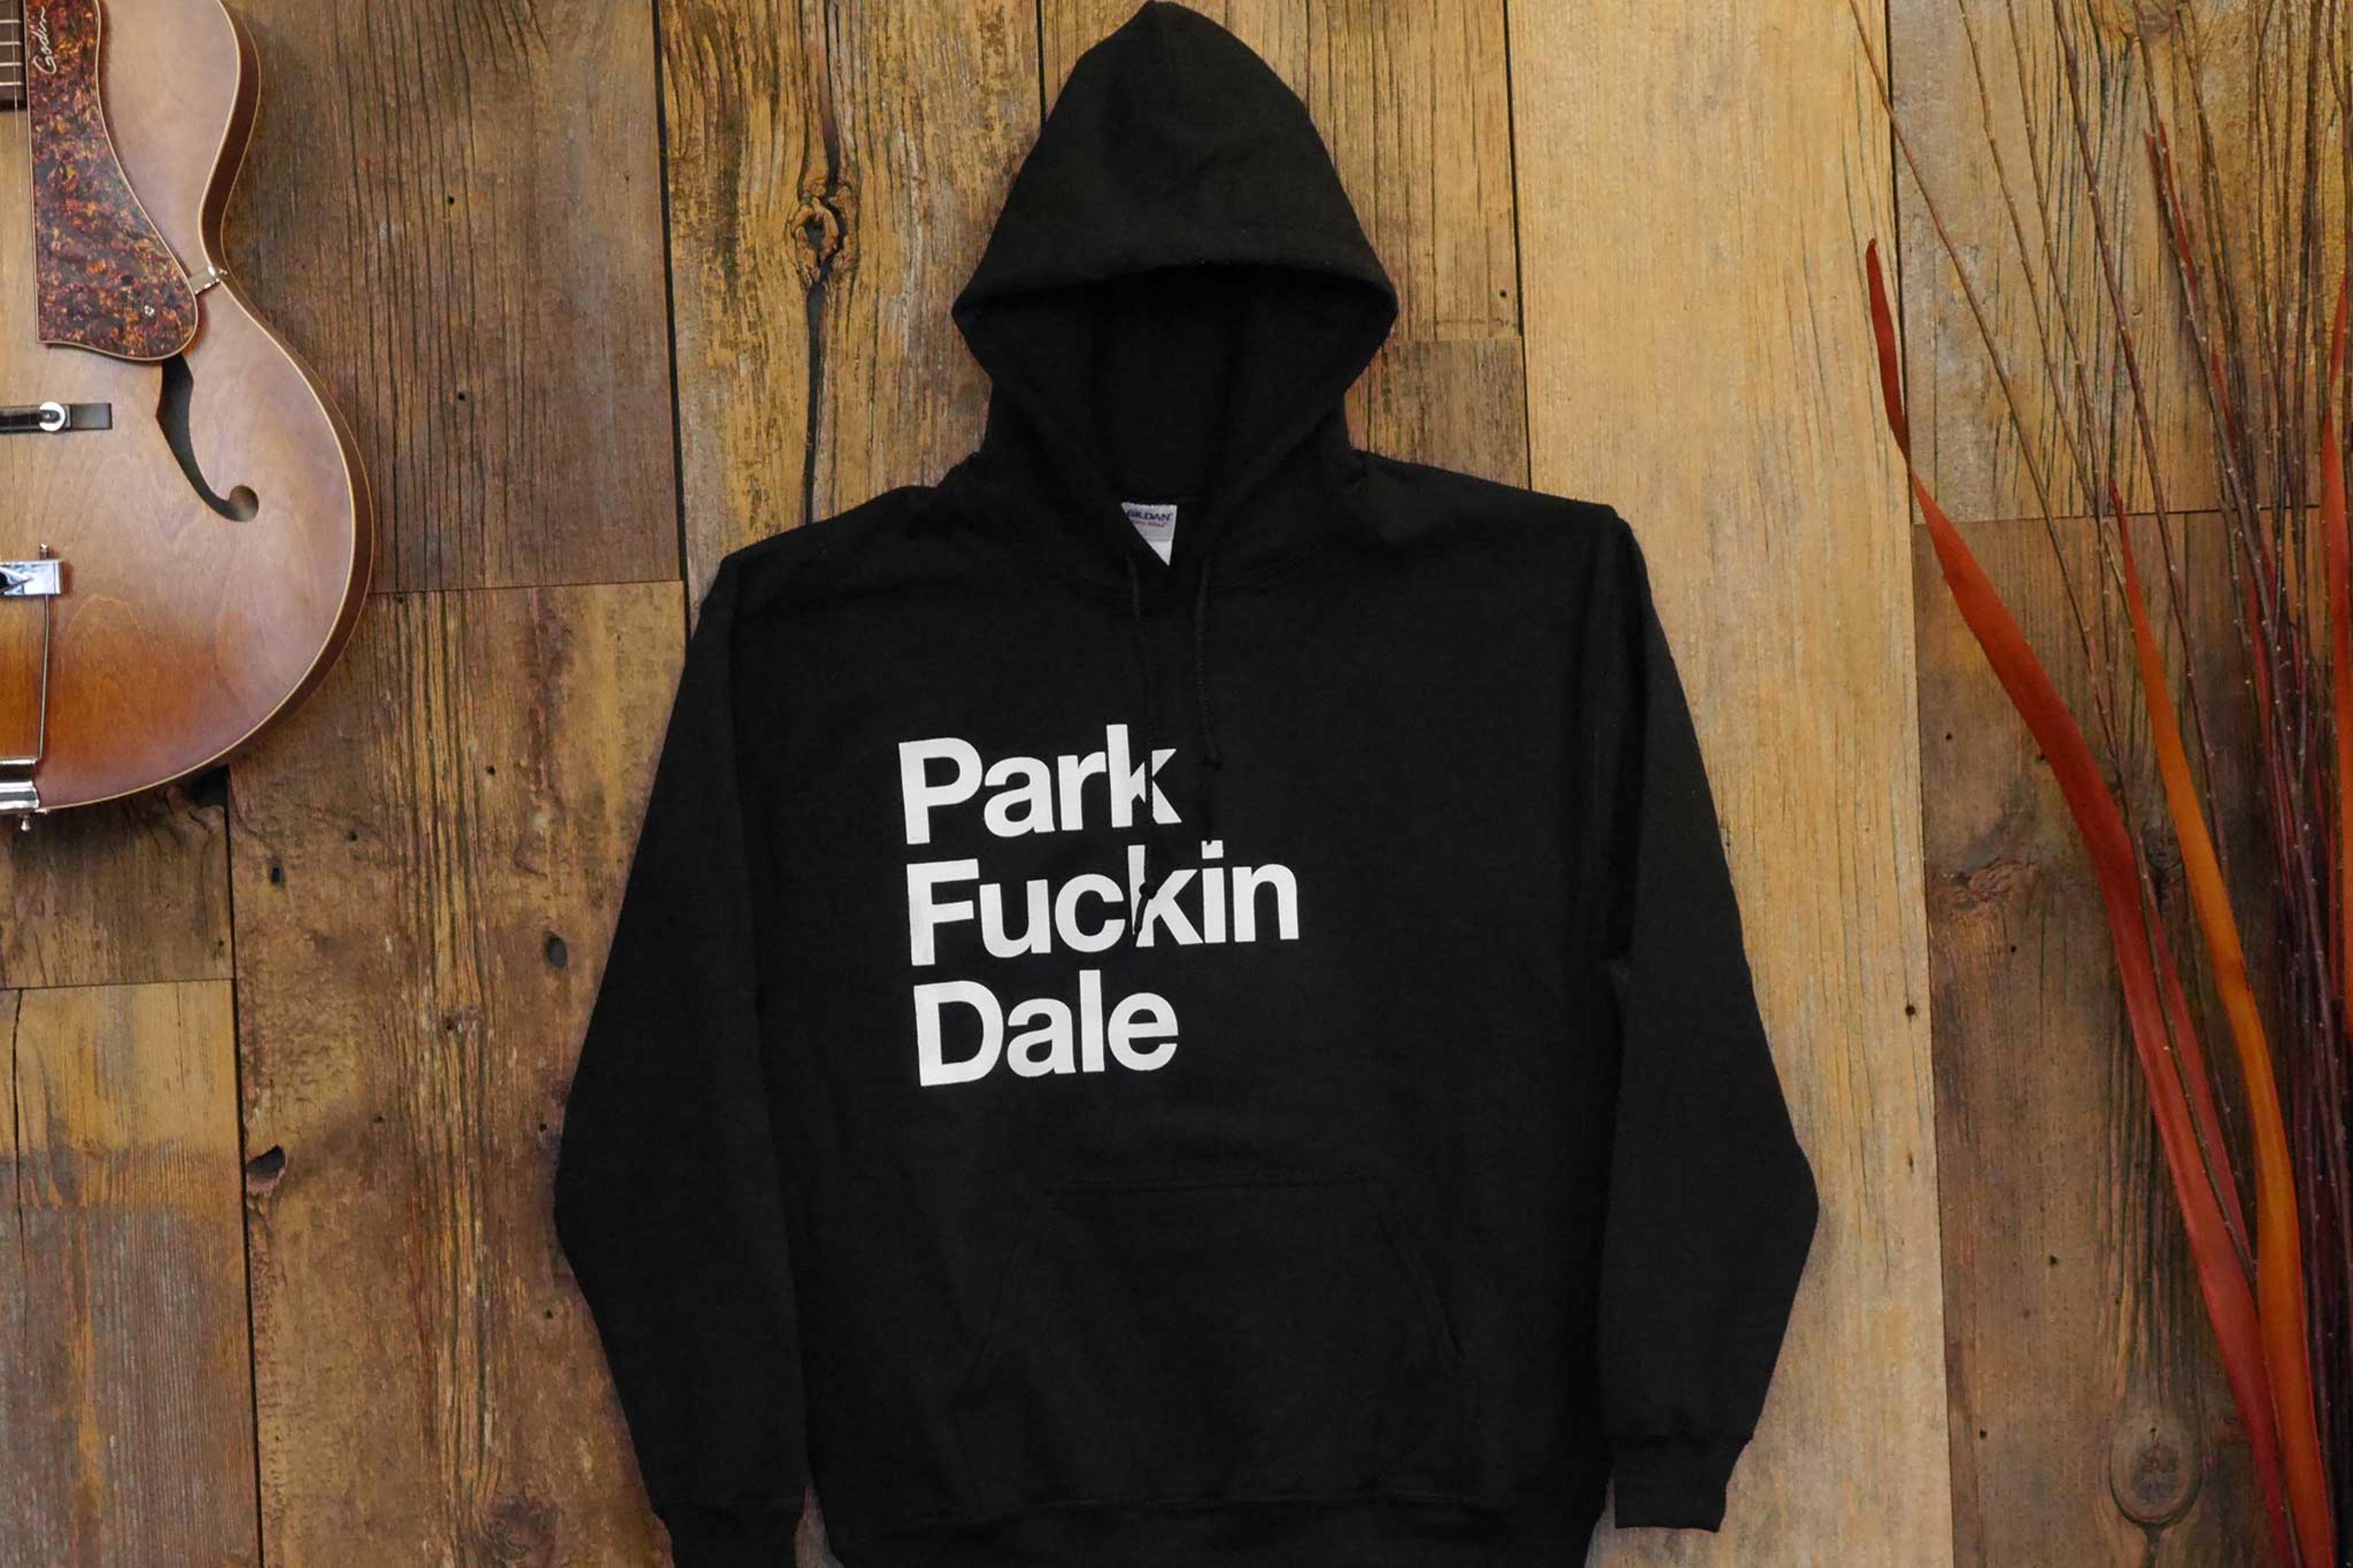 park fuckin dale